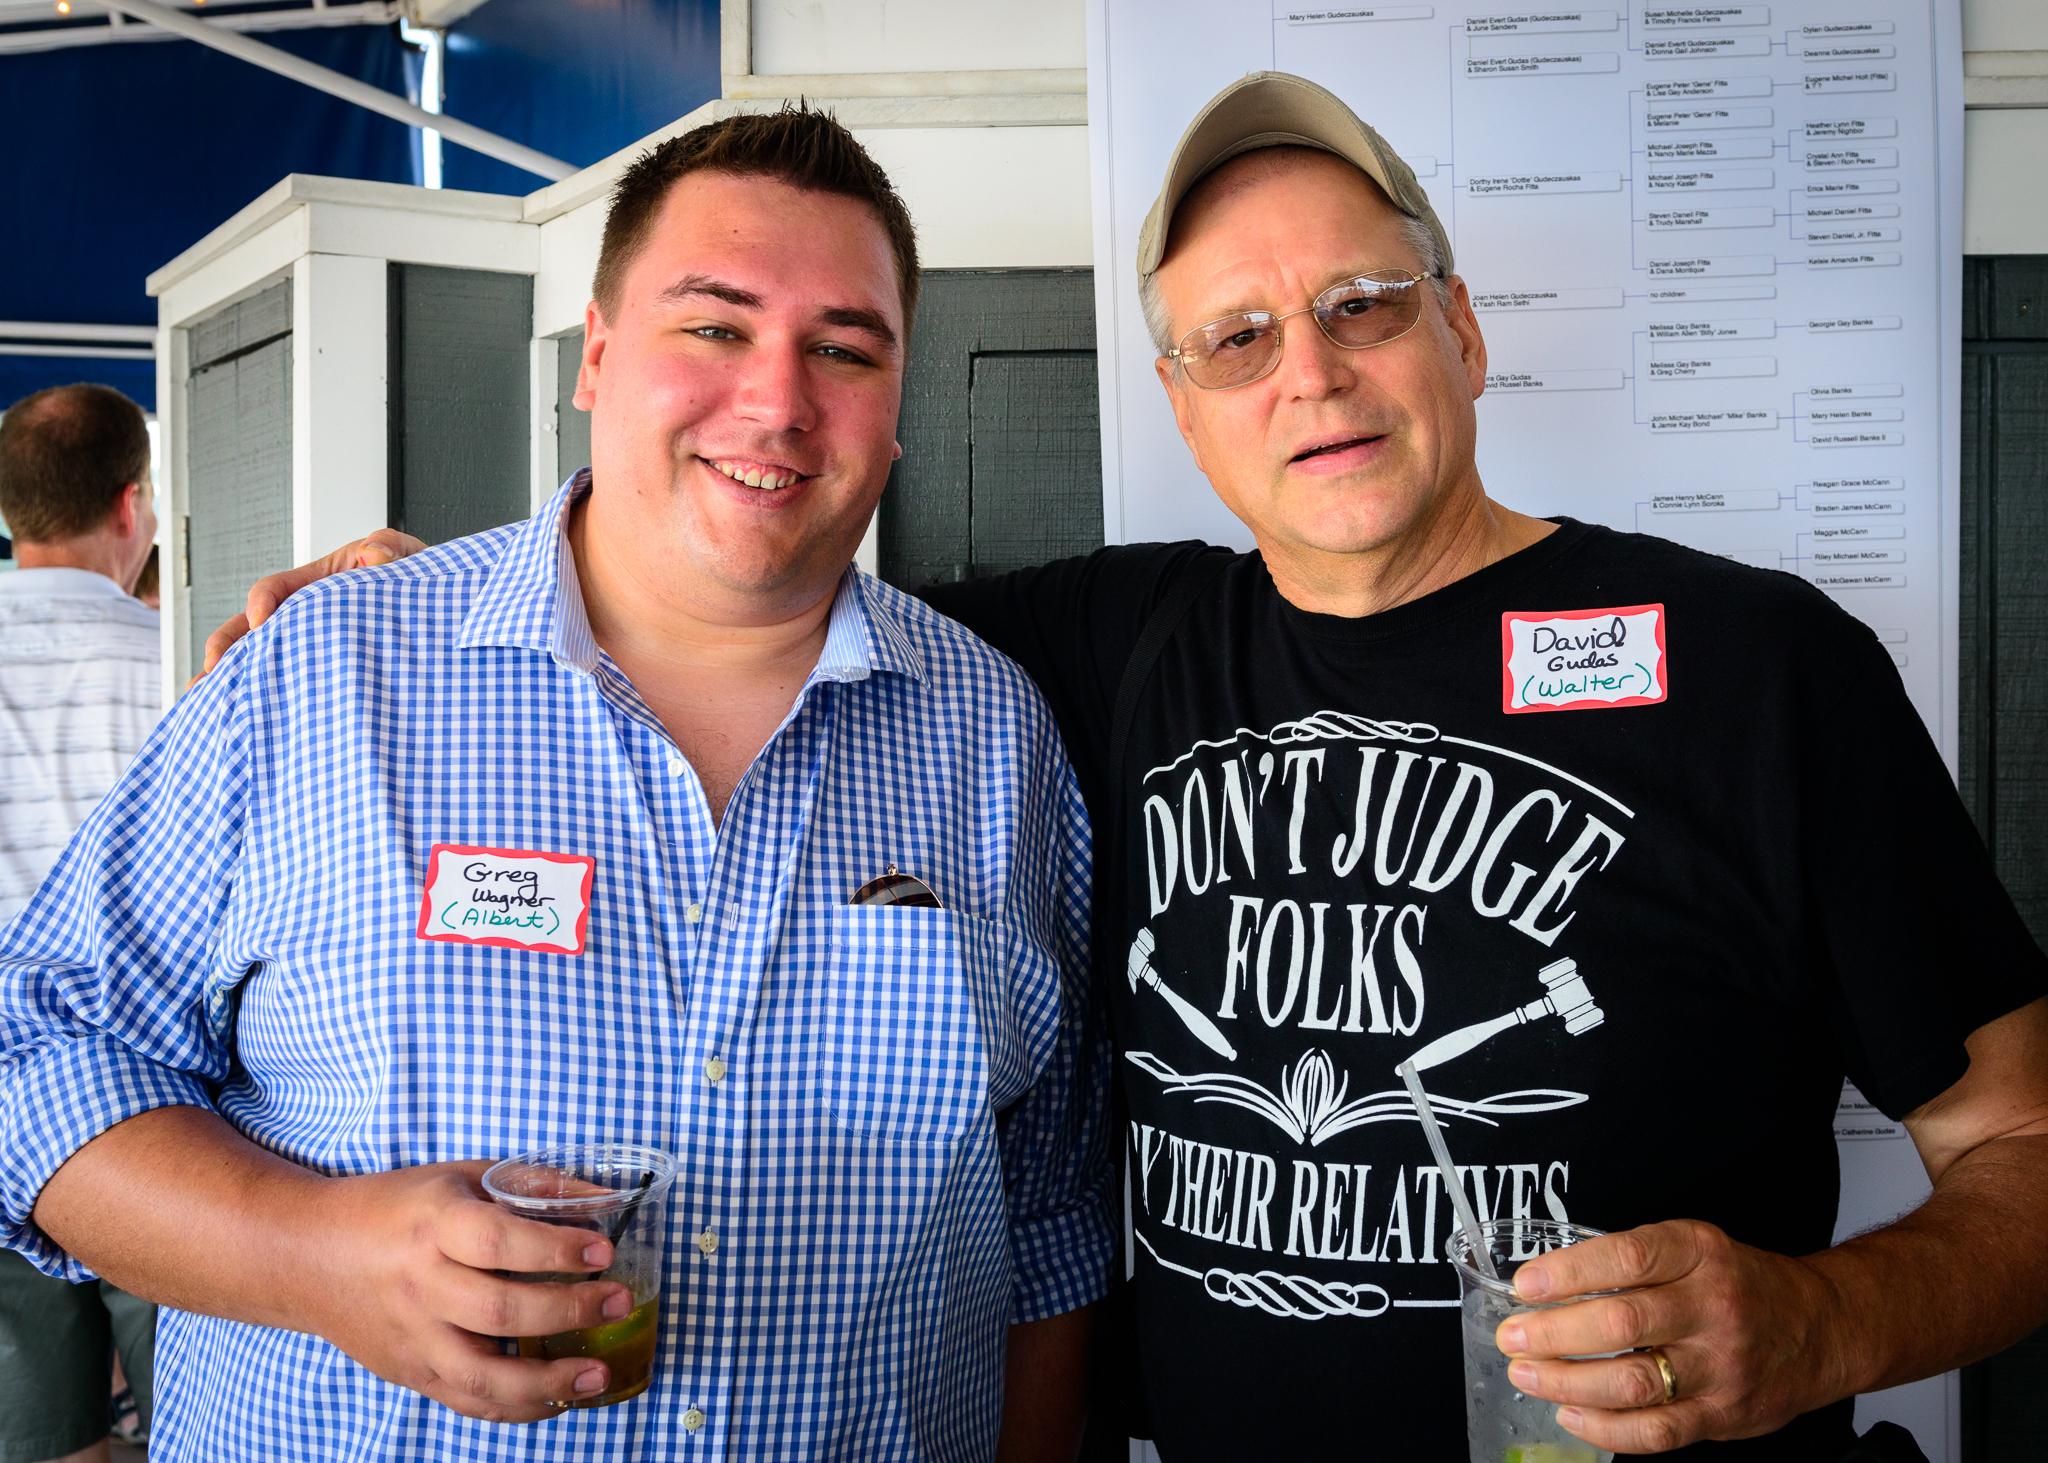 Greg Wagner (Al's grandson) & David Gudas (Walt's son)